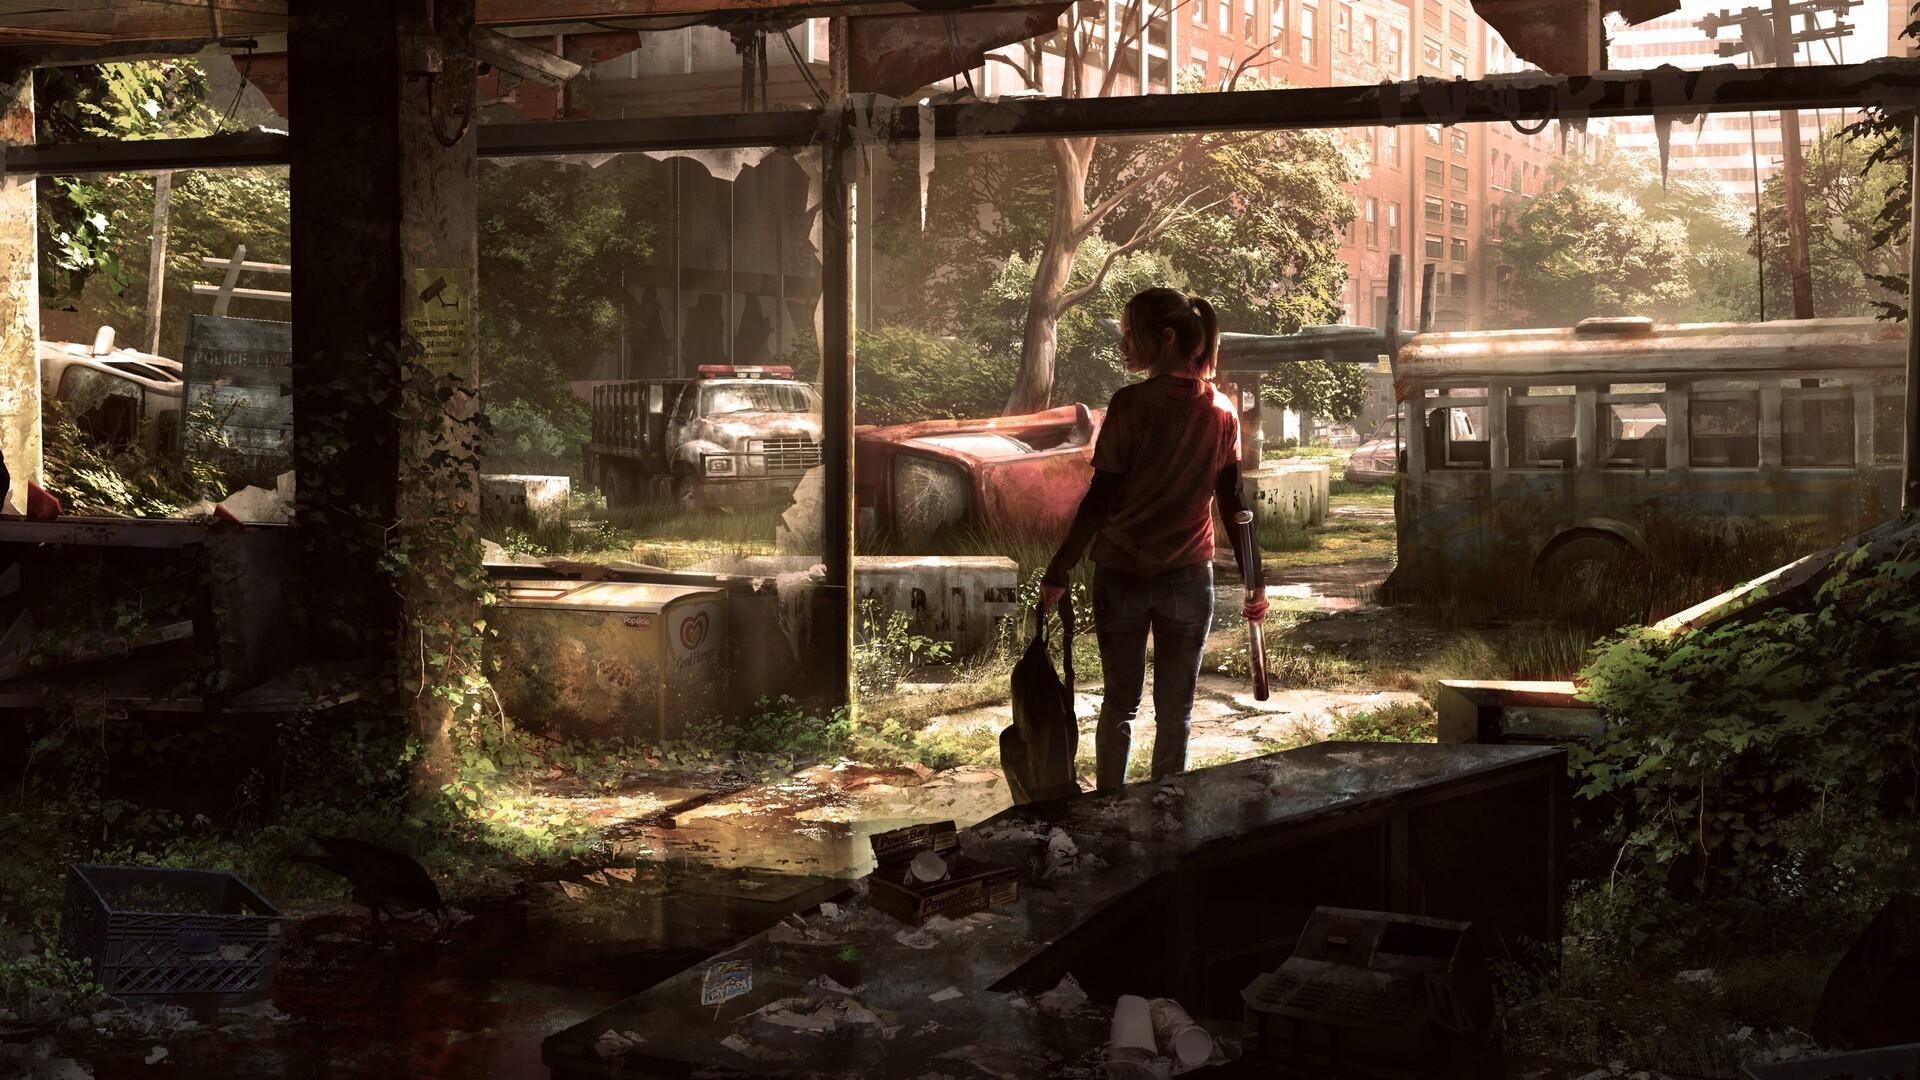 1920x1080 The Last Of Us Video Game 4k Laptop Full Hd 1080p Hd 4k